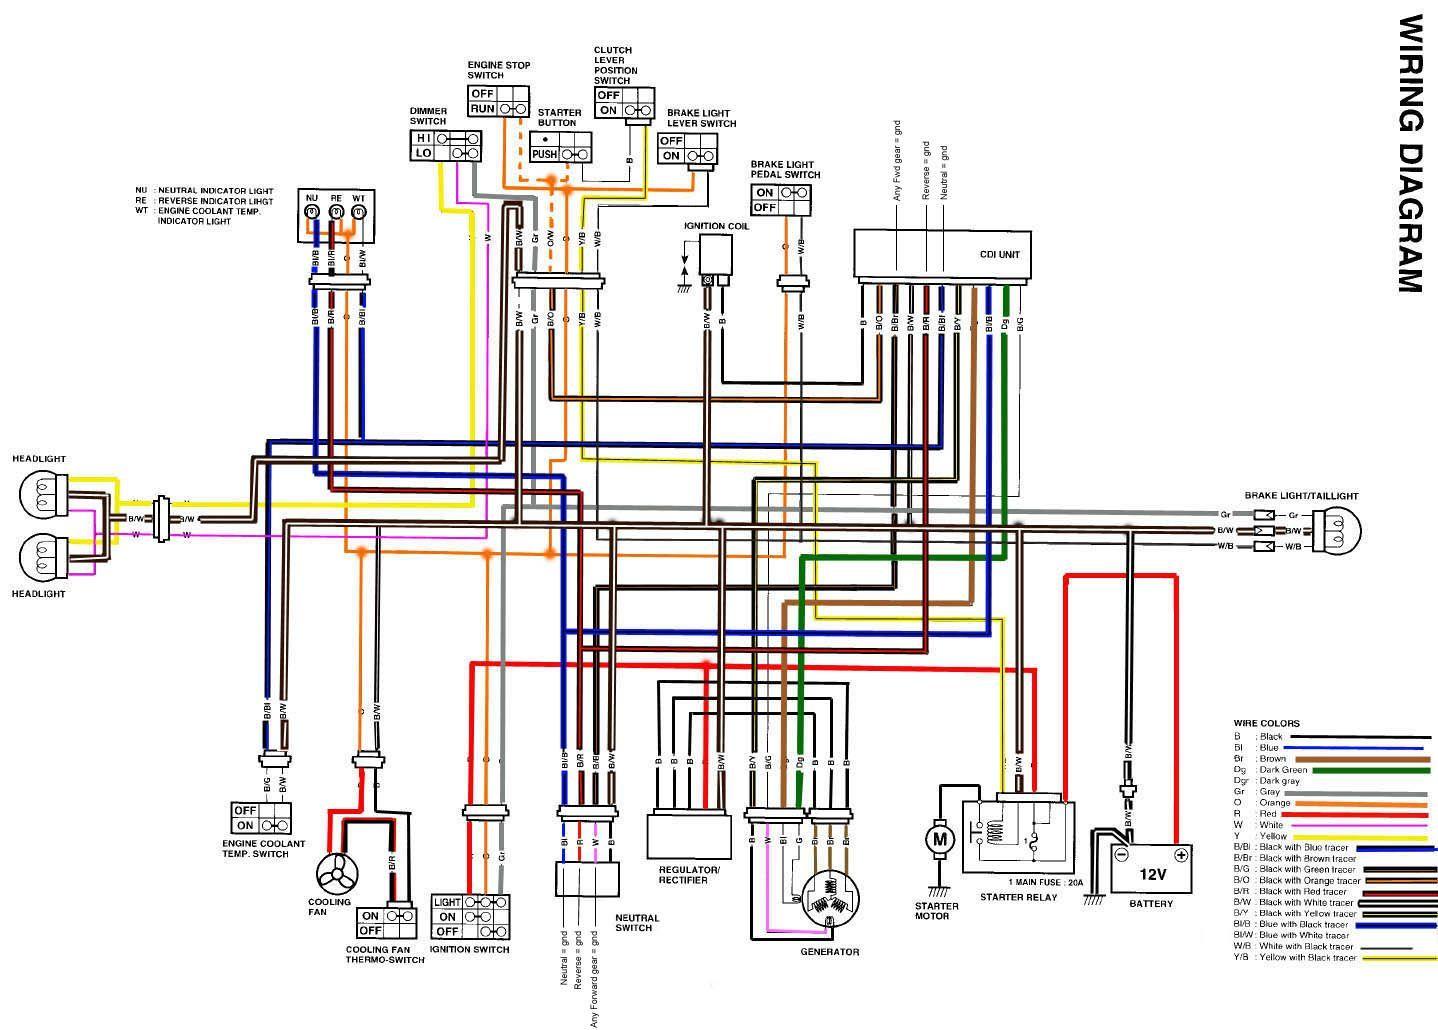 Esquema Electrico Sportster 883 Montajes Electricos En 2020 Esquemas Electricos Sportster Montajes Electricos